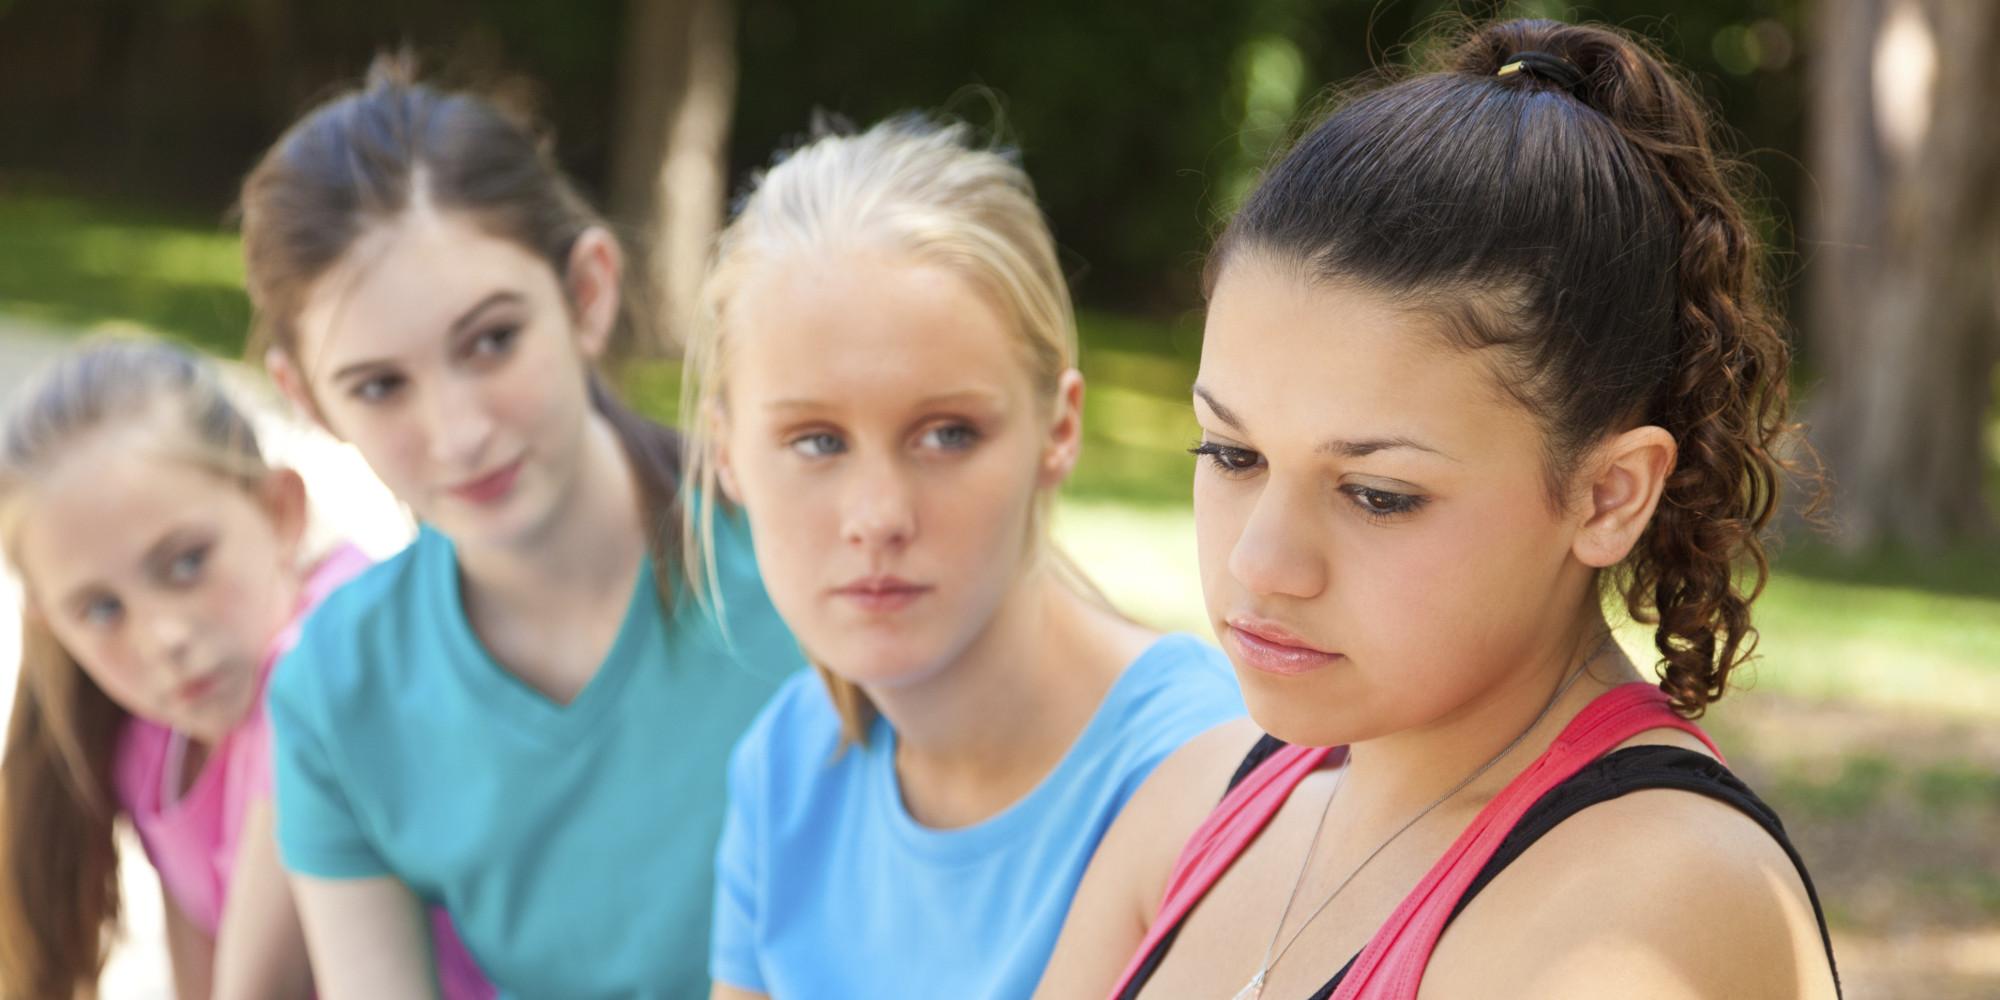 LGBTQ Kids Shouldn't Feel Anxious Going To School ...